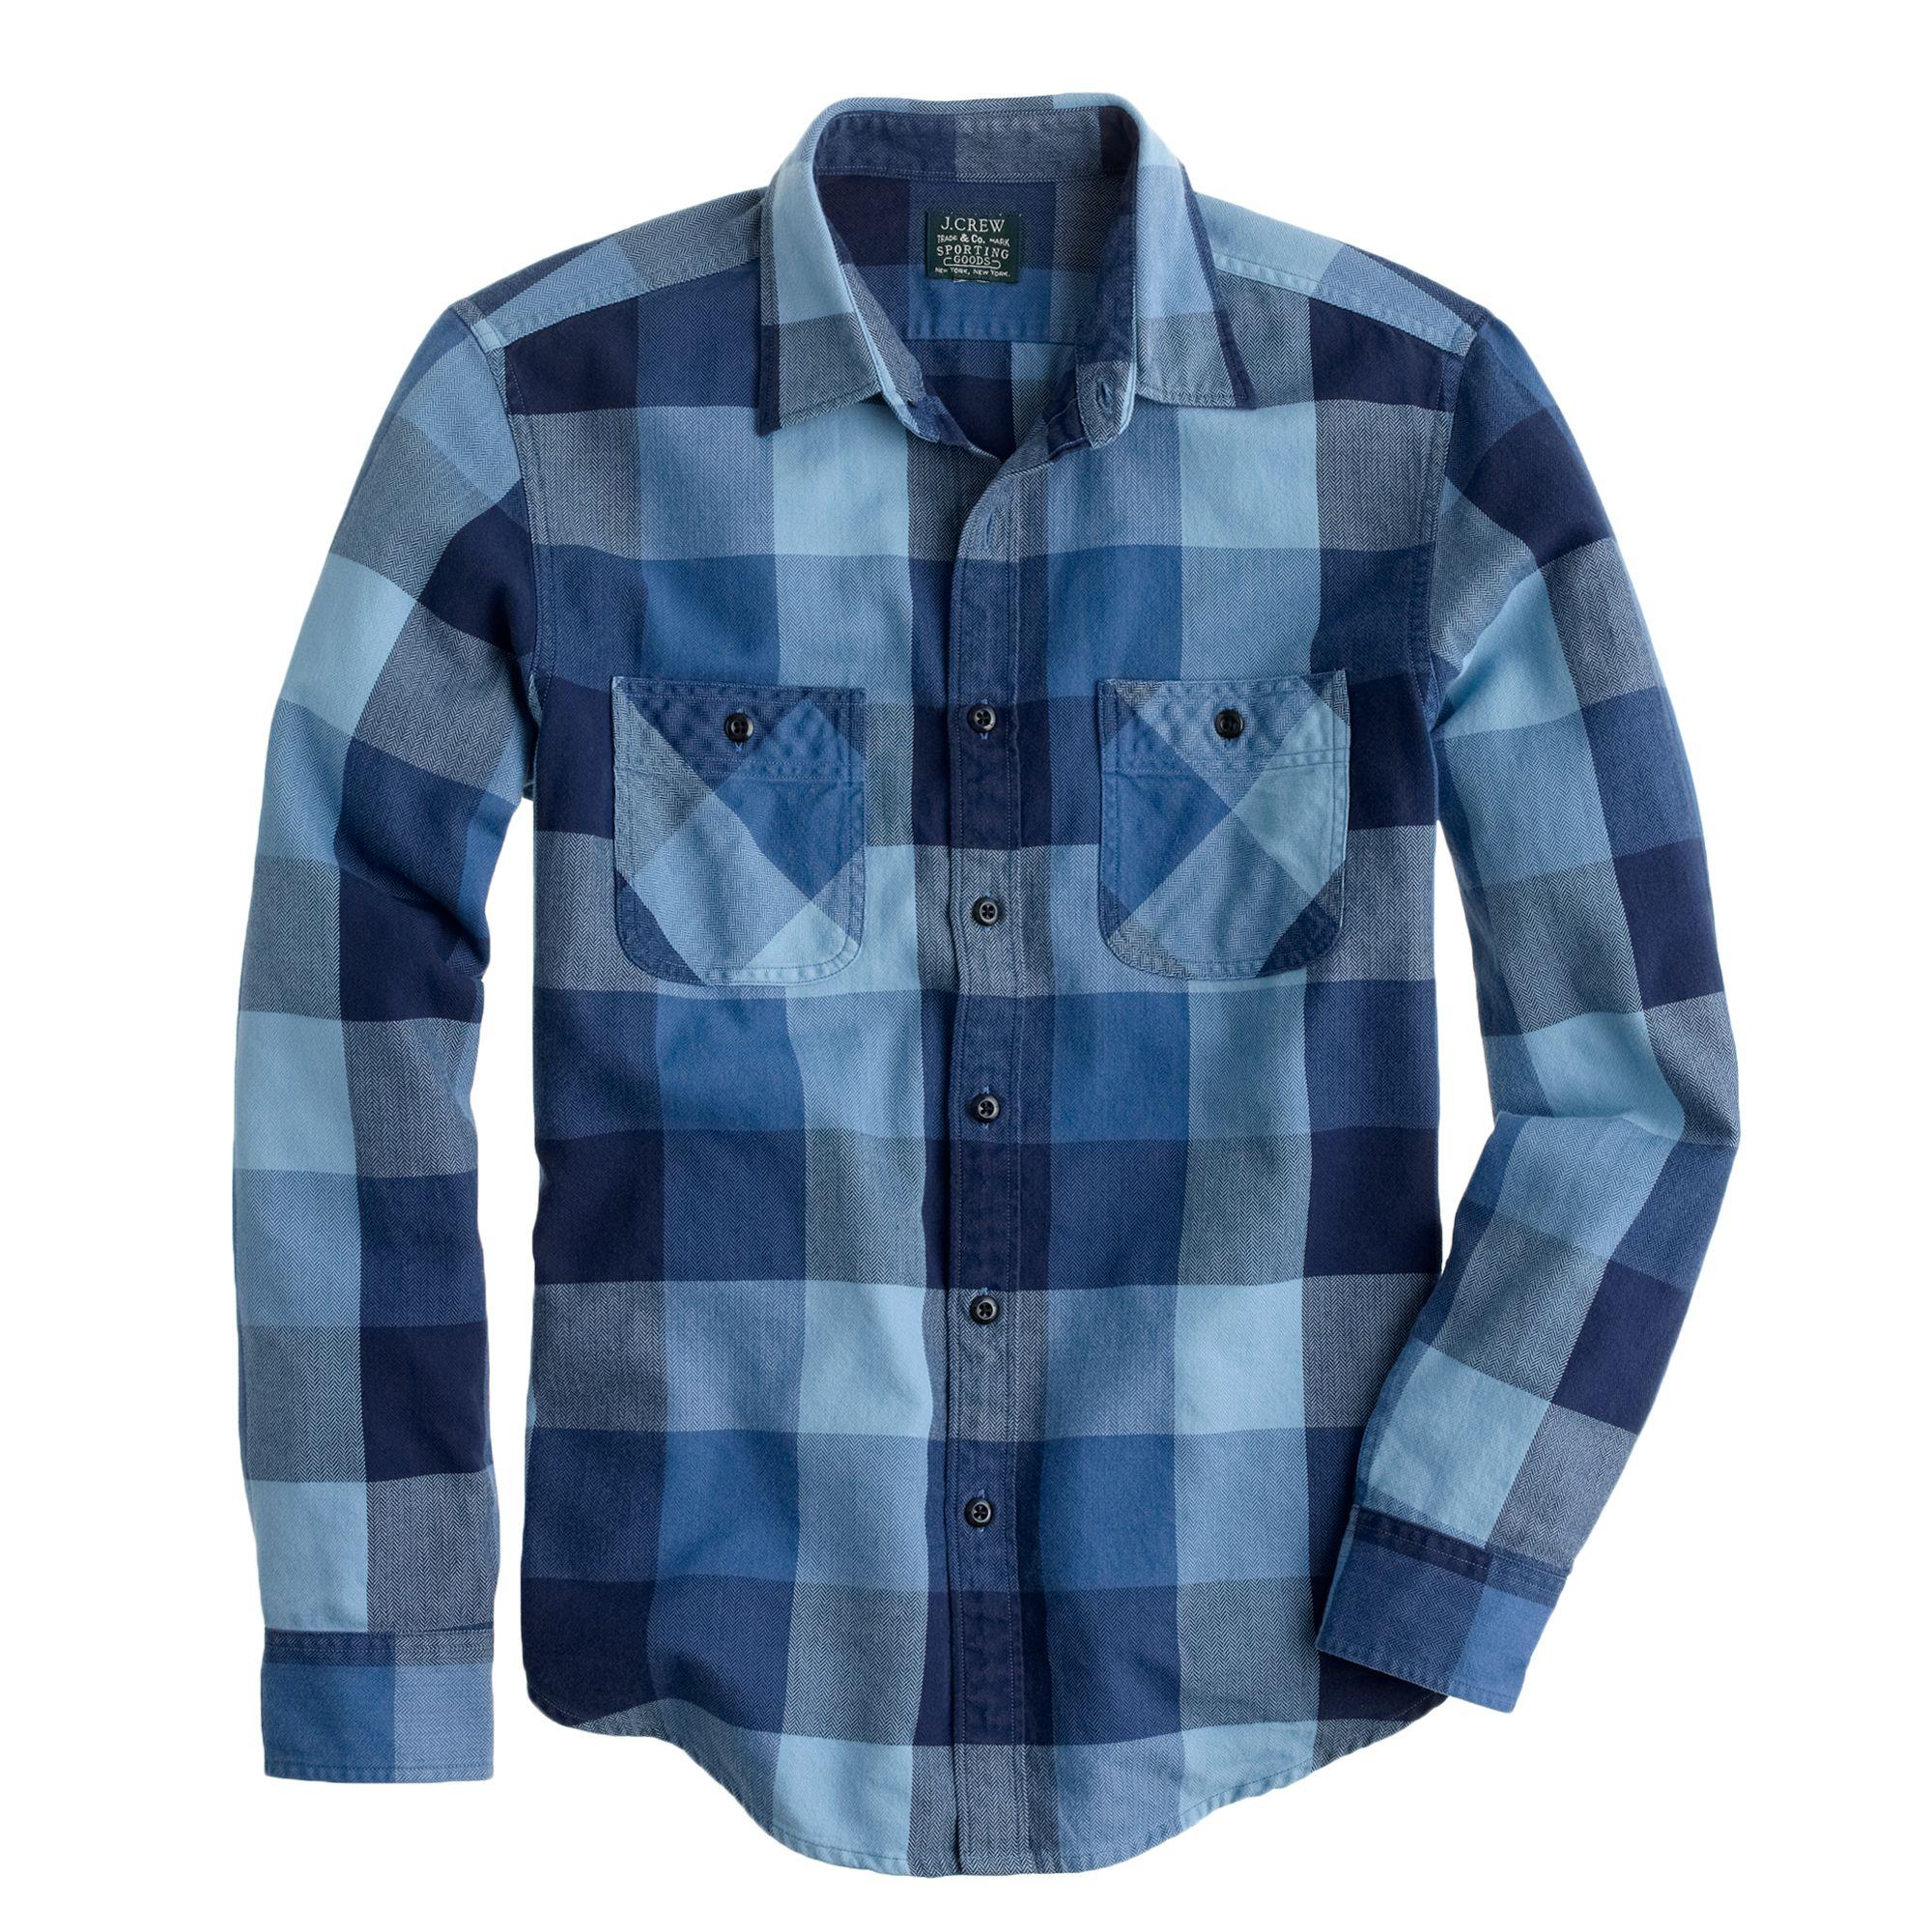 Tall flannel shirt in warm indigo herringbone plaid for Mens warm flannel shirts